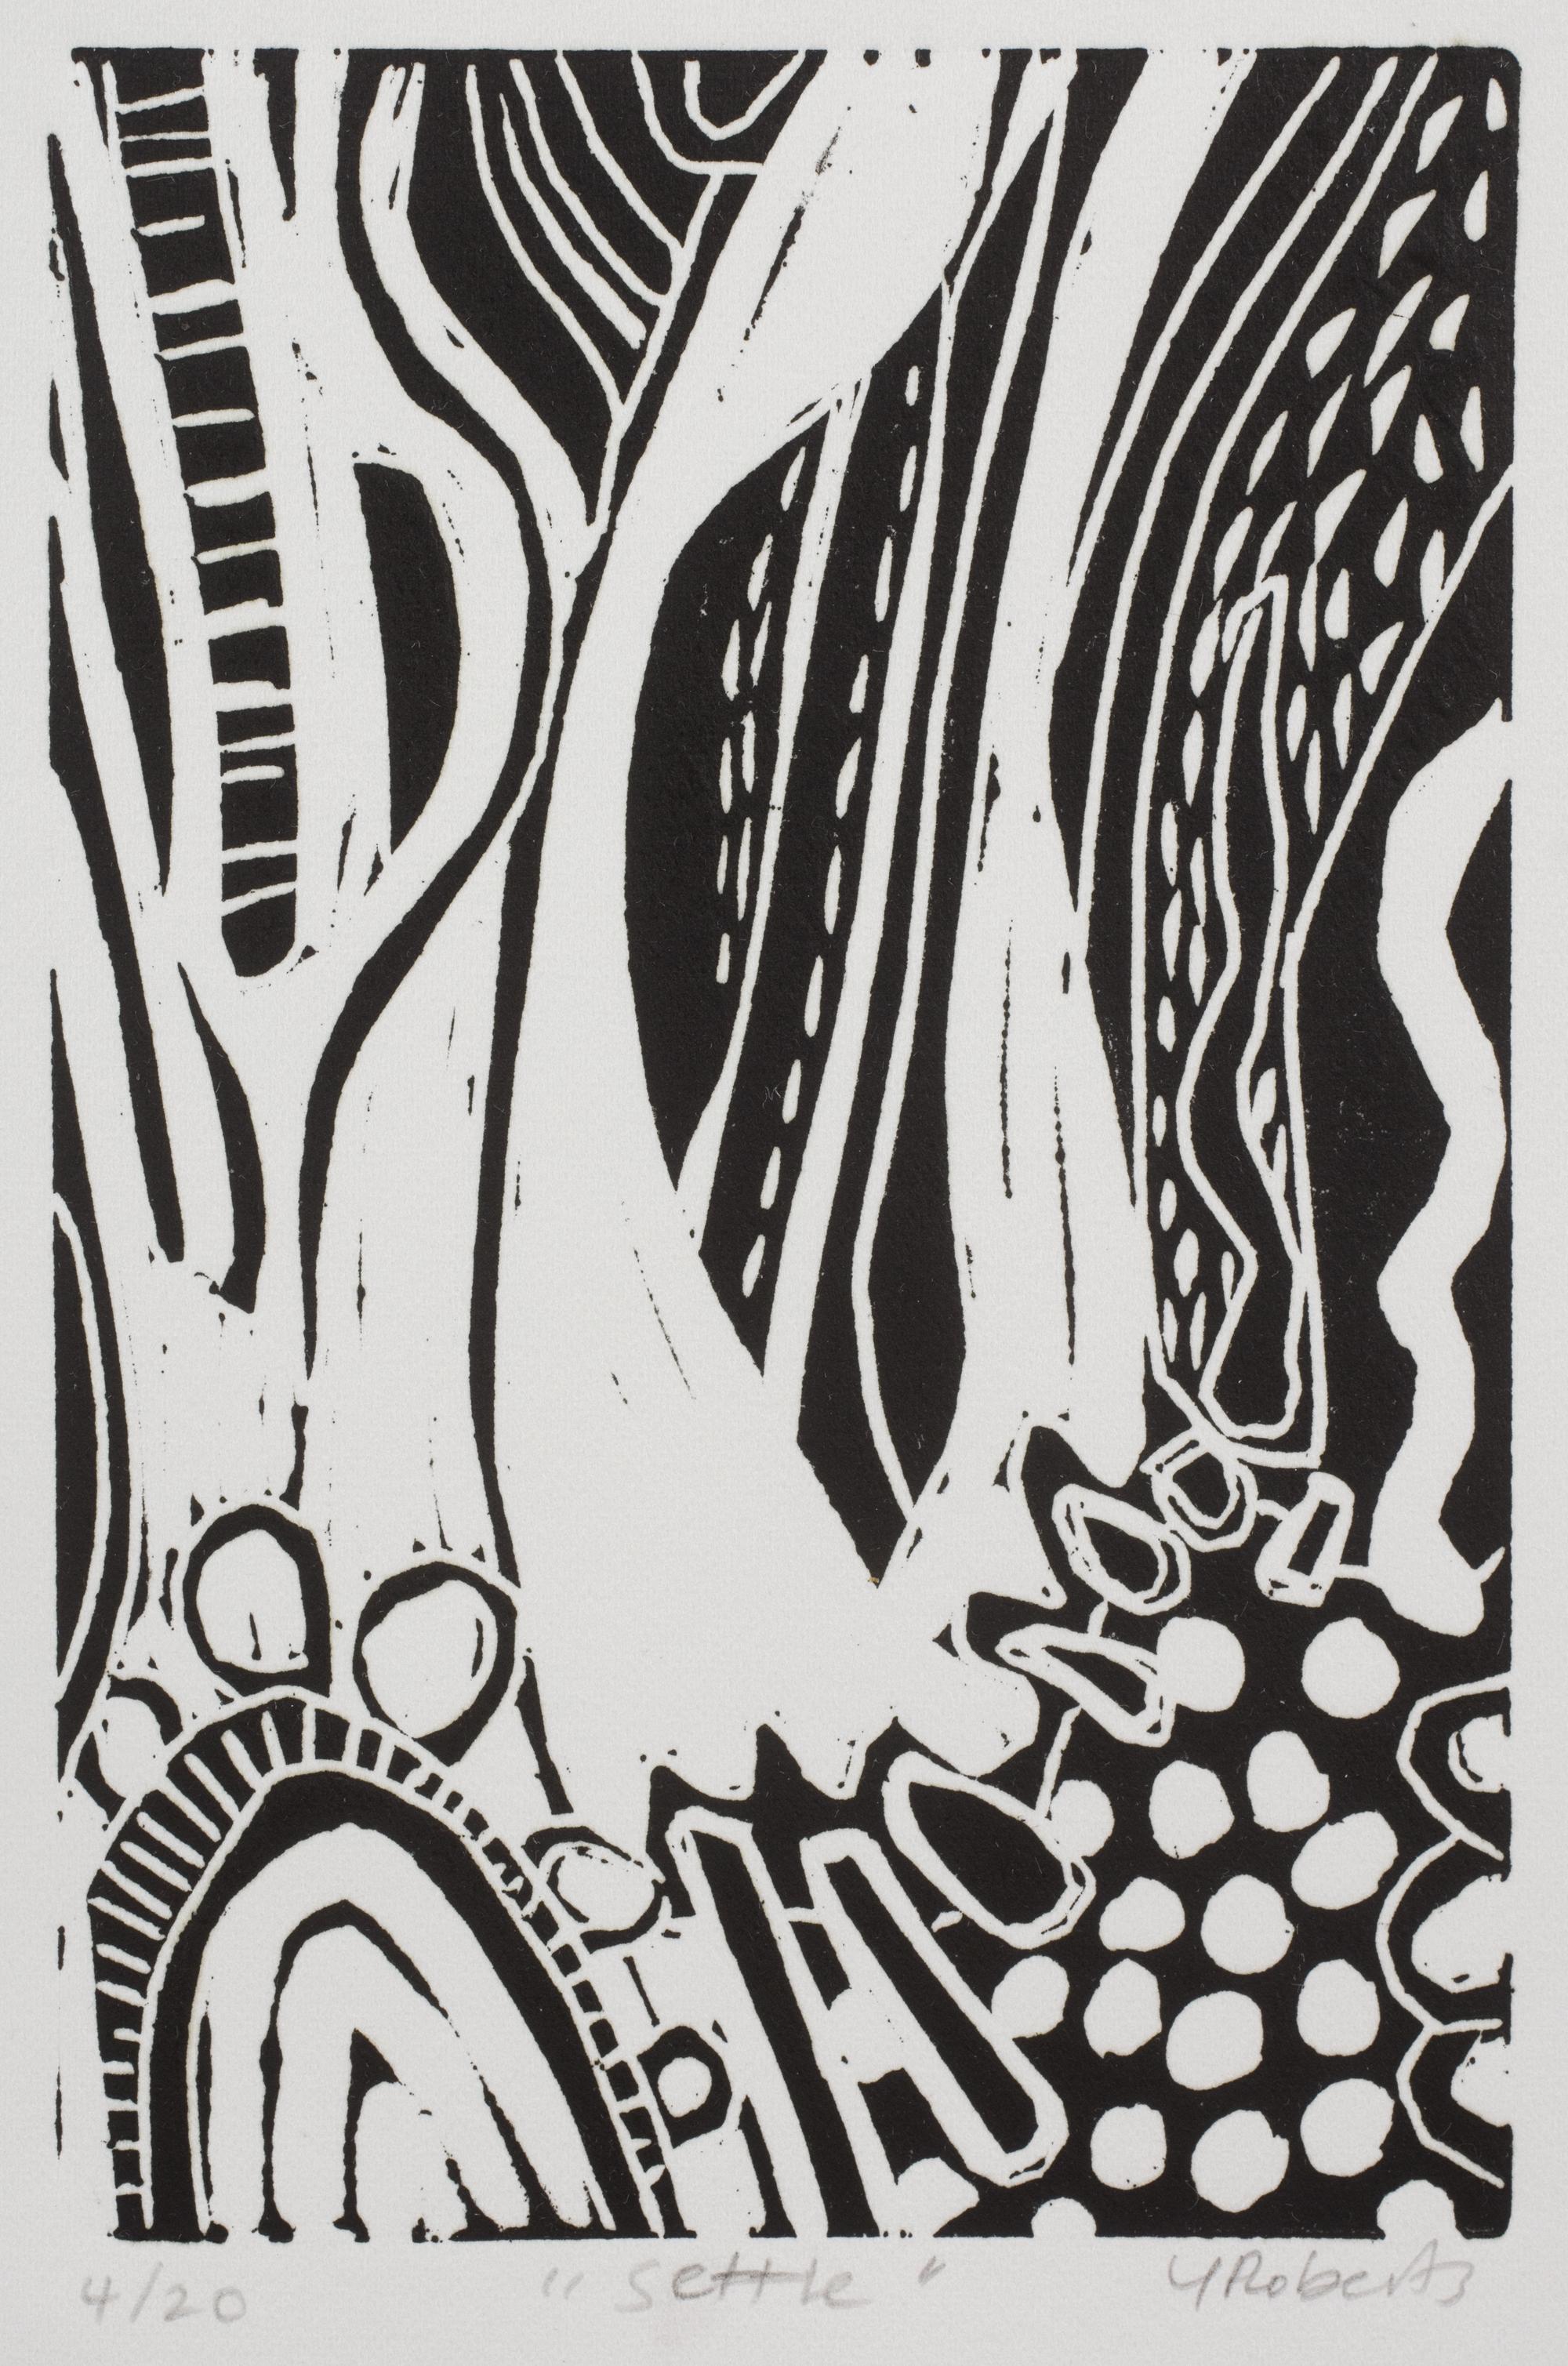 Settle , Linocut, edition 4/20